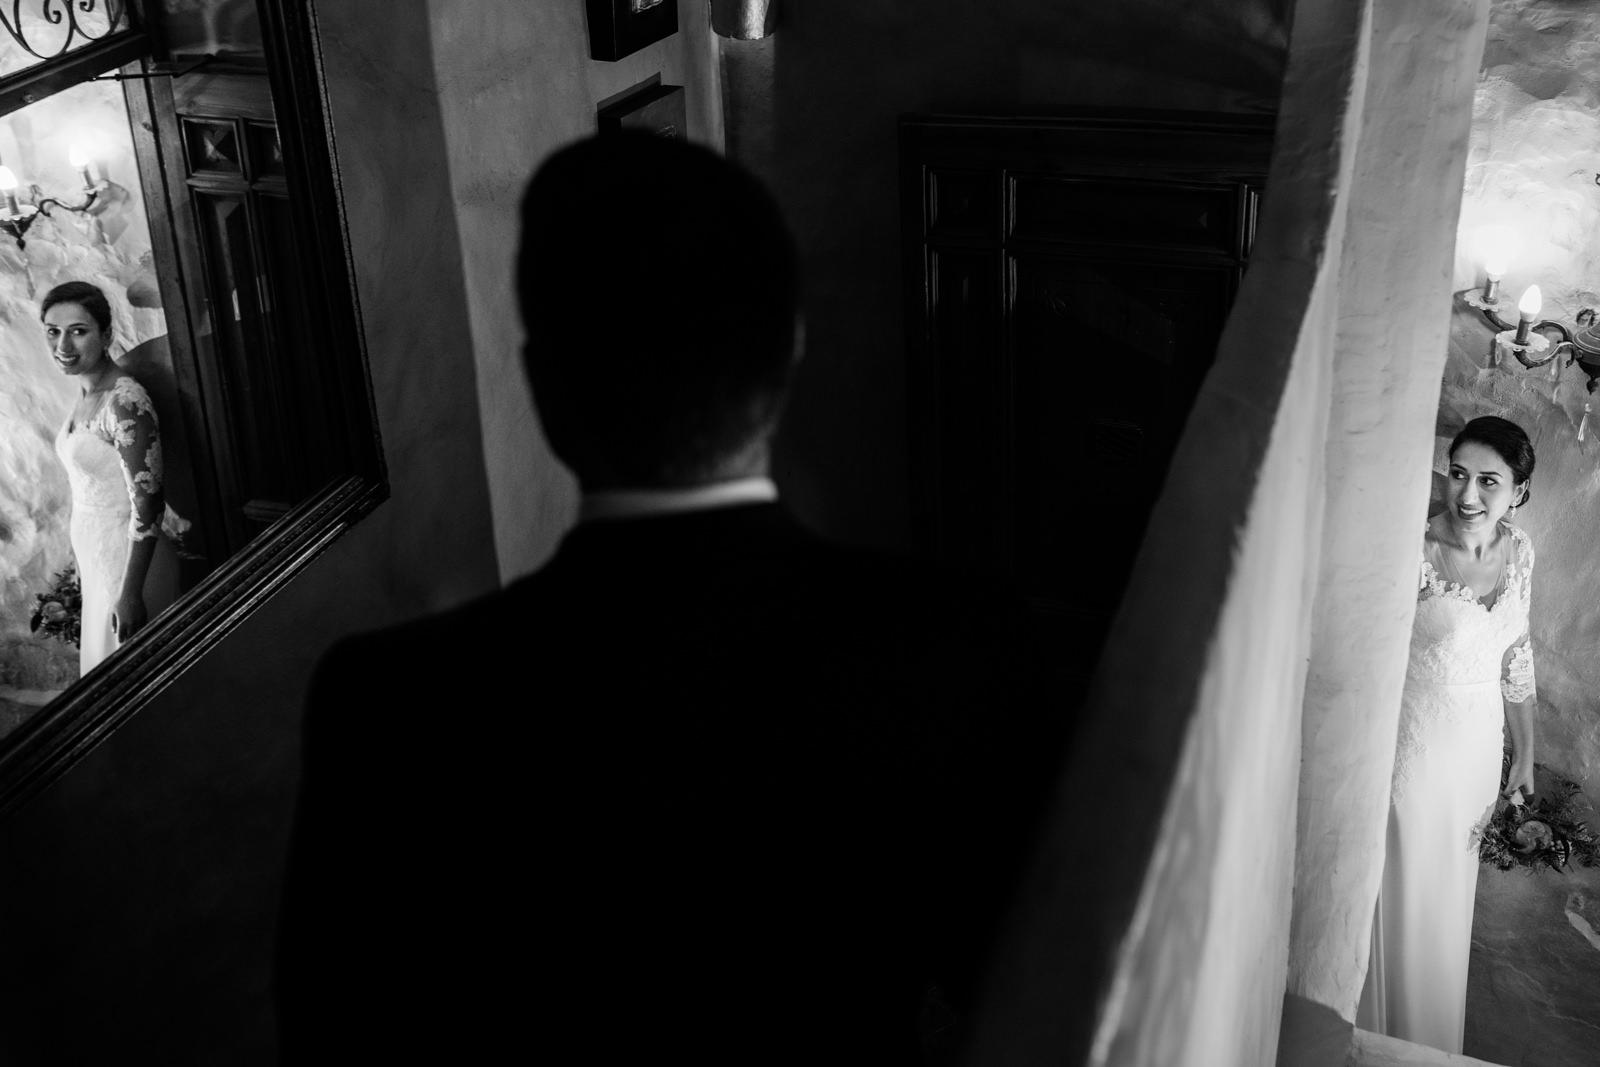 Almirall-Font-sitges-marbella-engagement-Rafael-Torres-fotografo-bodas-sevilla-madrid-barcelona-wedding-photographer--59.jpg